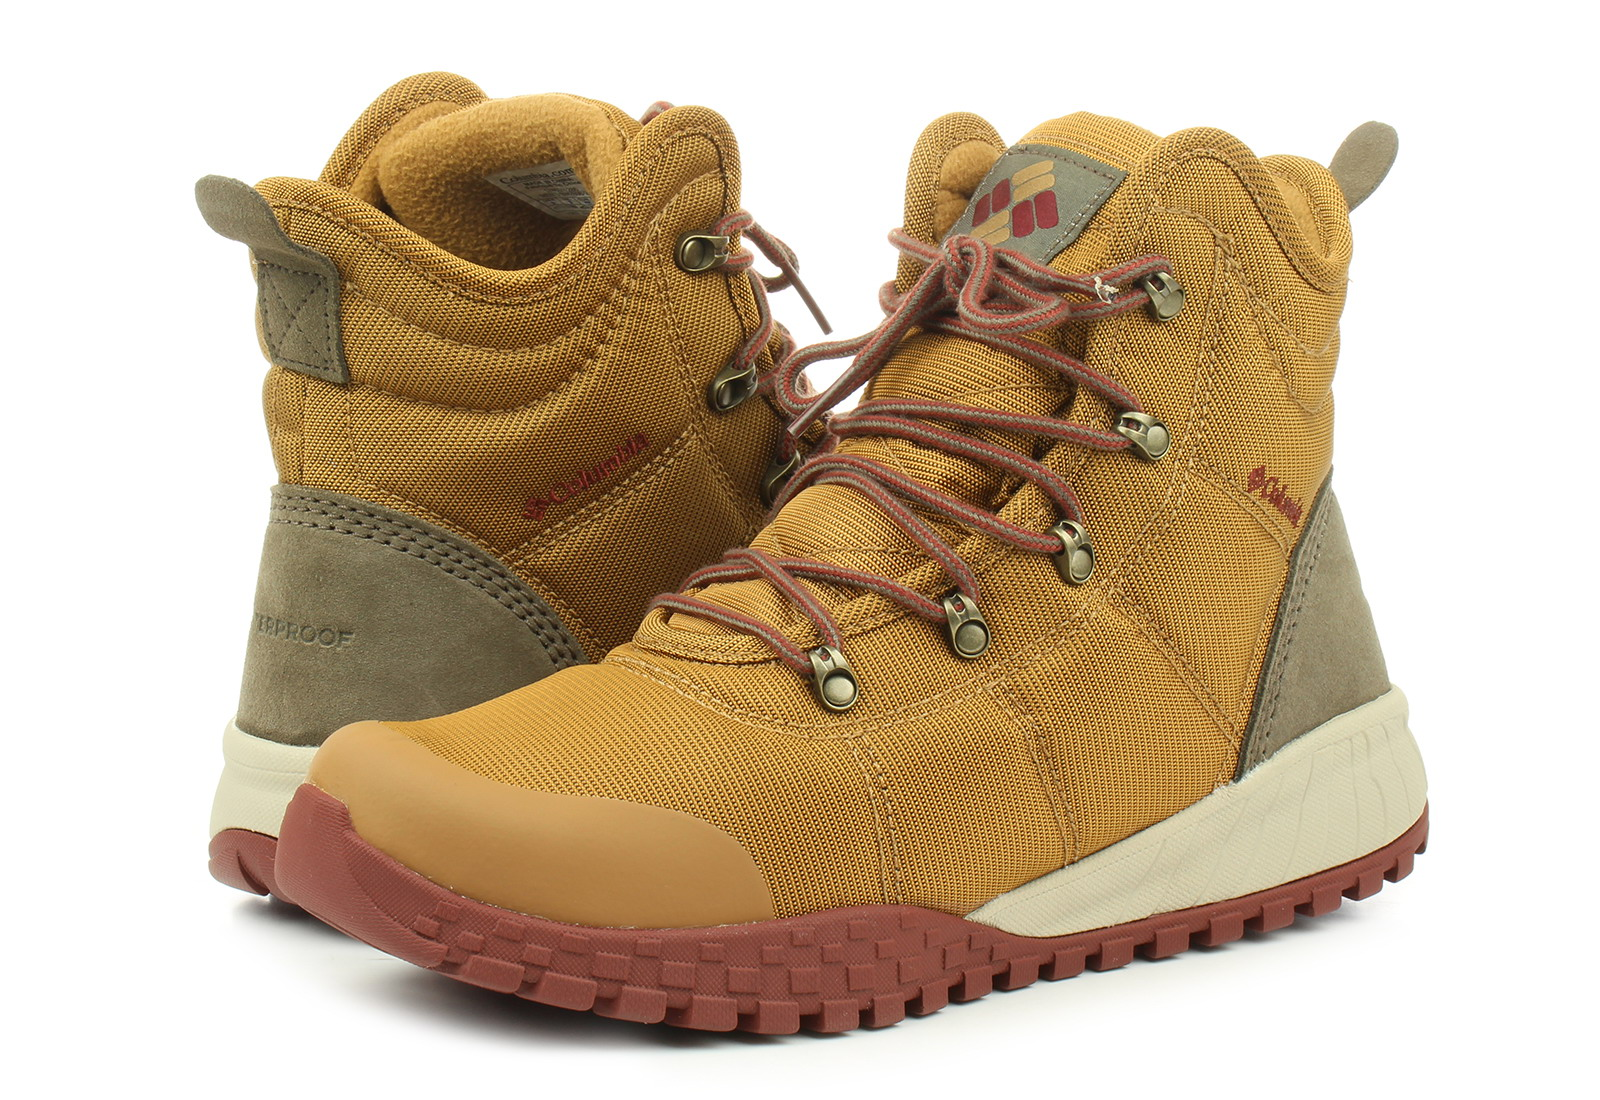 Columbia Bakancs - Fairbanks Omni-heat - 1746011-elk - Office Shoes ... ecfd784107